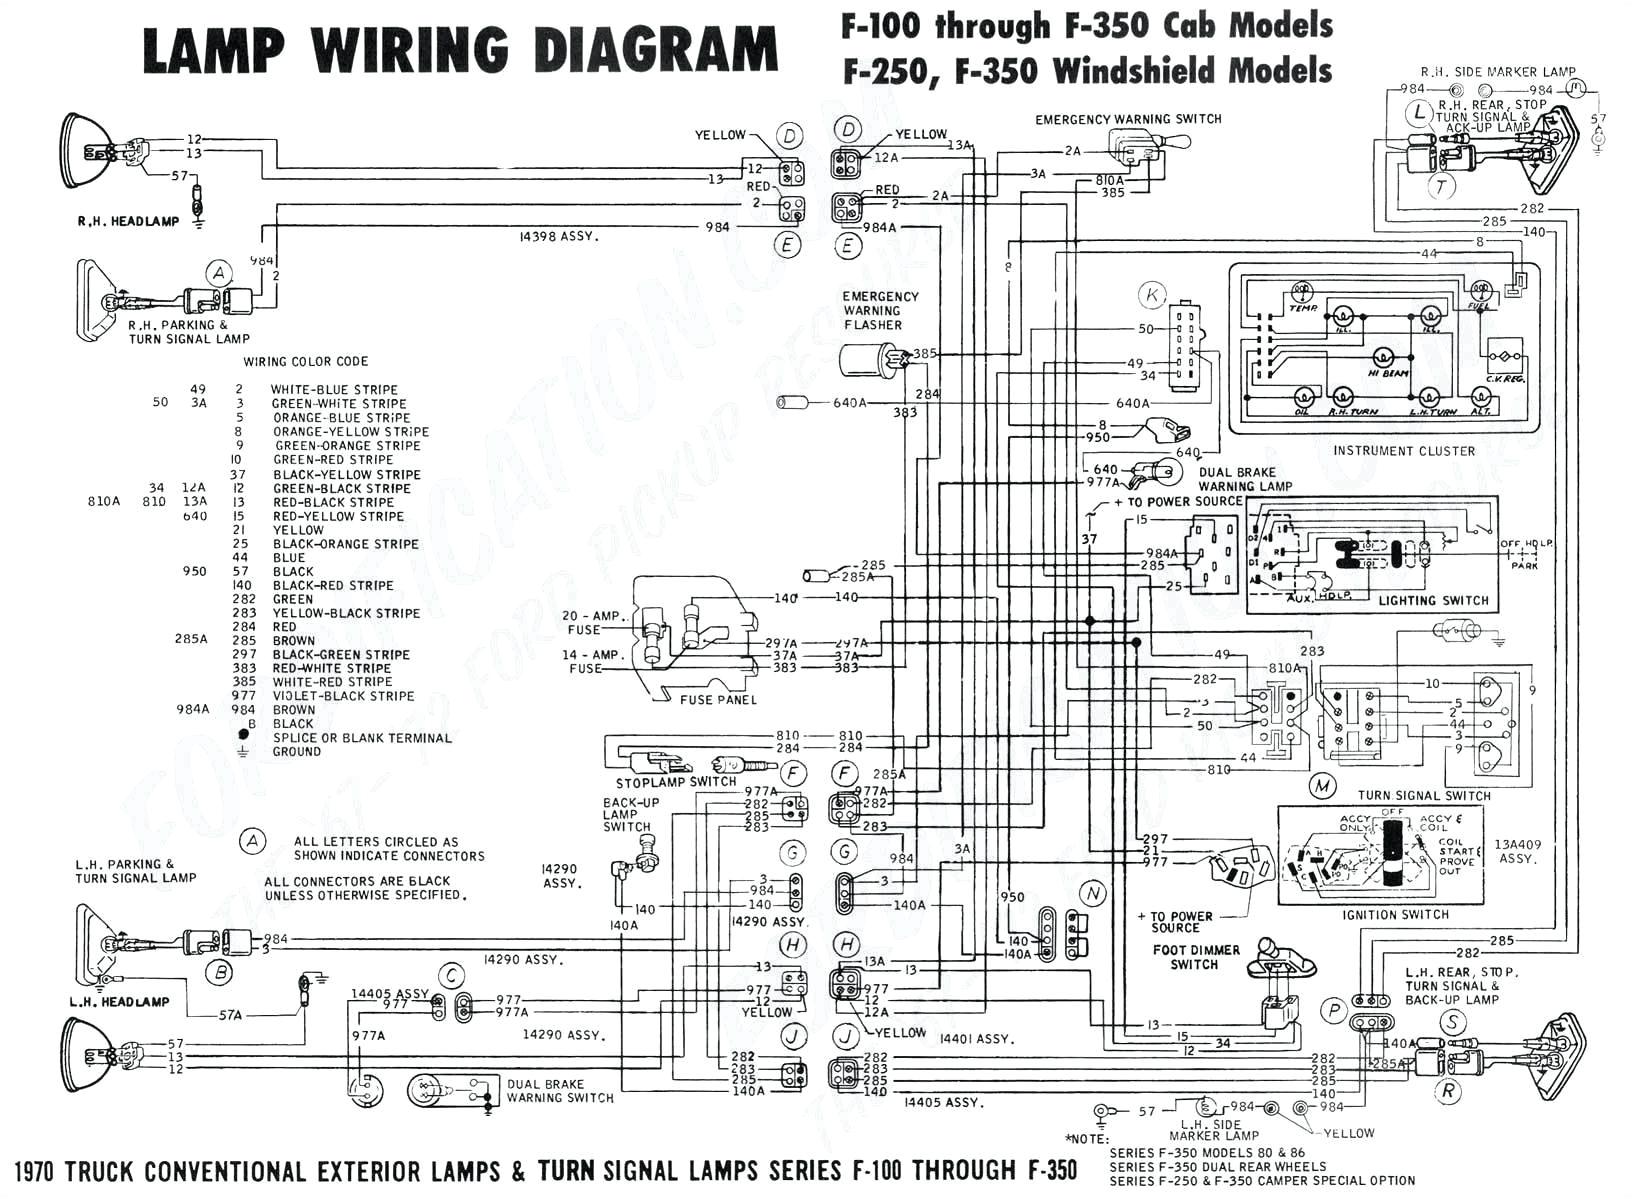 2011 peterbilt wiring diagram wiring diagram database freightliner m2 wiring diagrams on 1986 ford e 350 wiring diagram